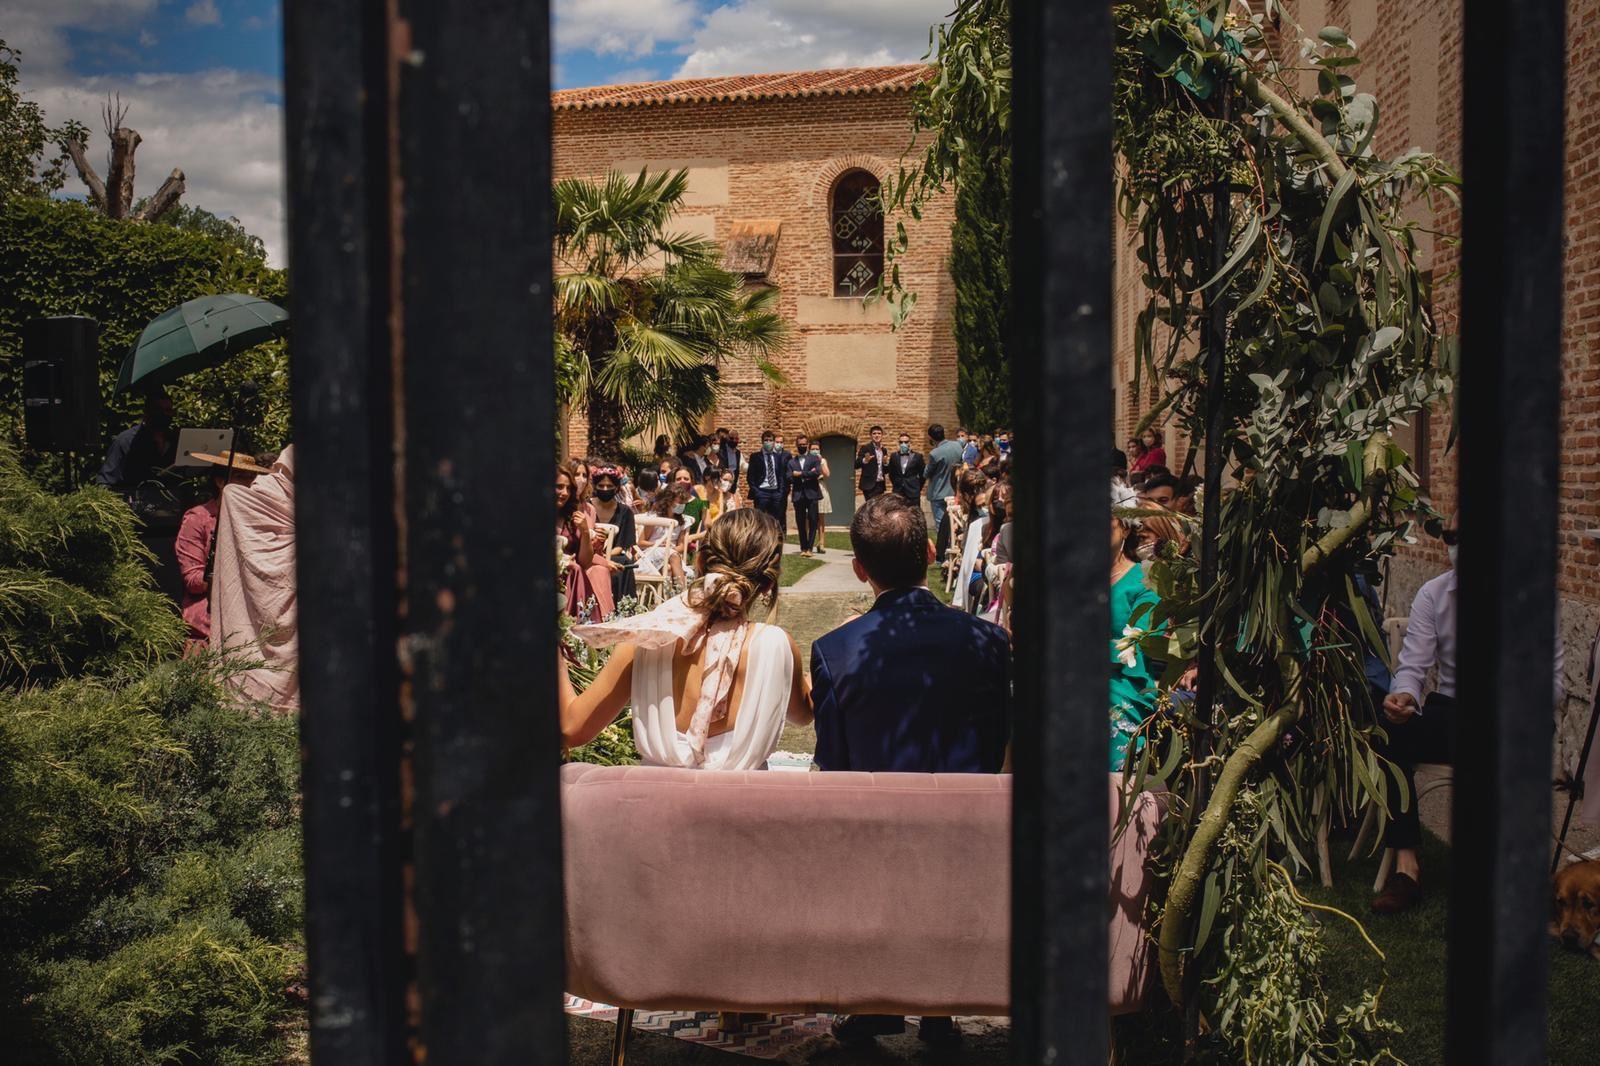 Urban wedding in Valladolid